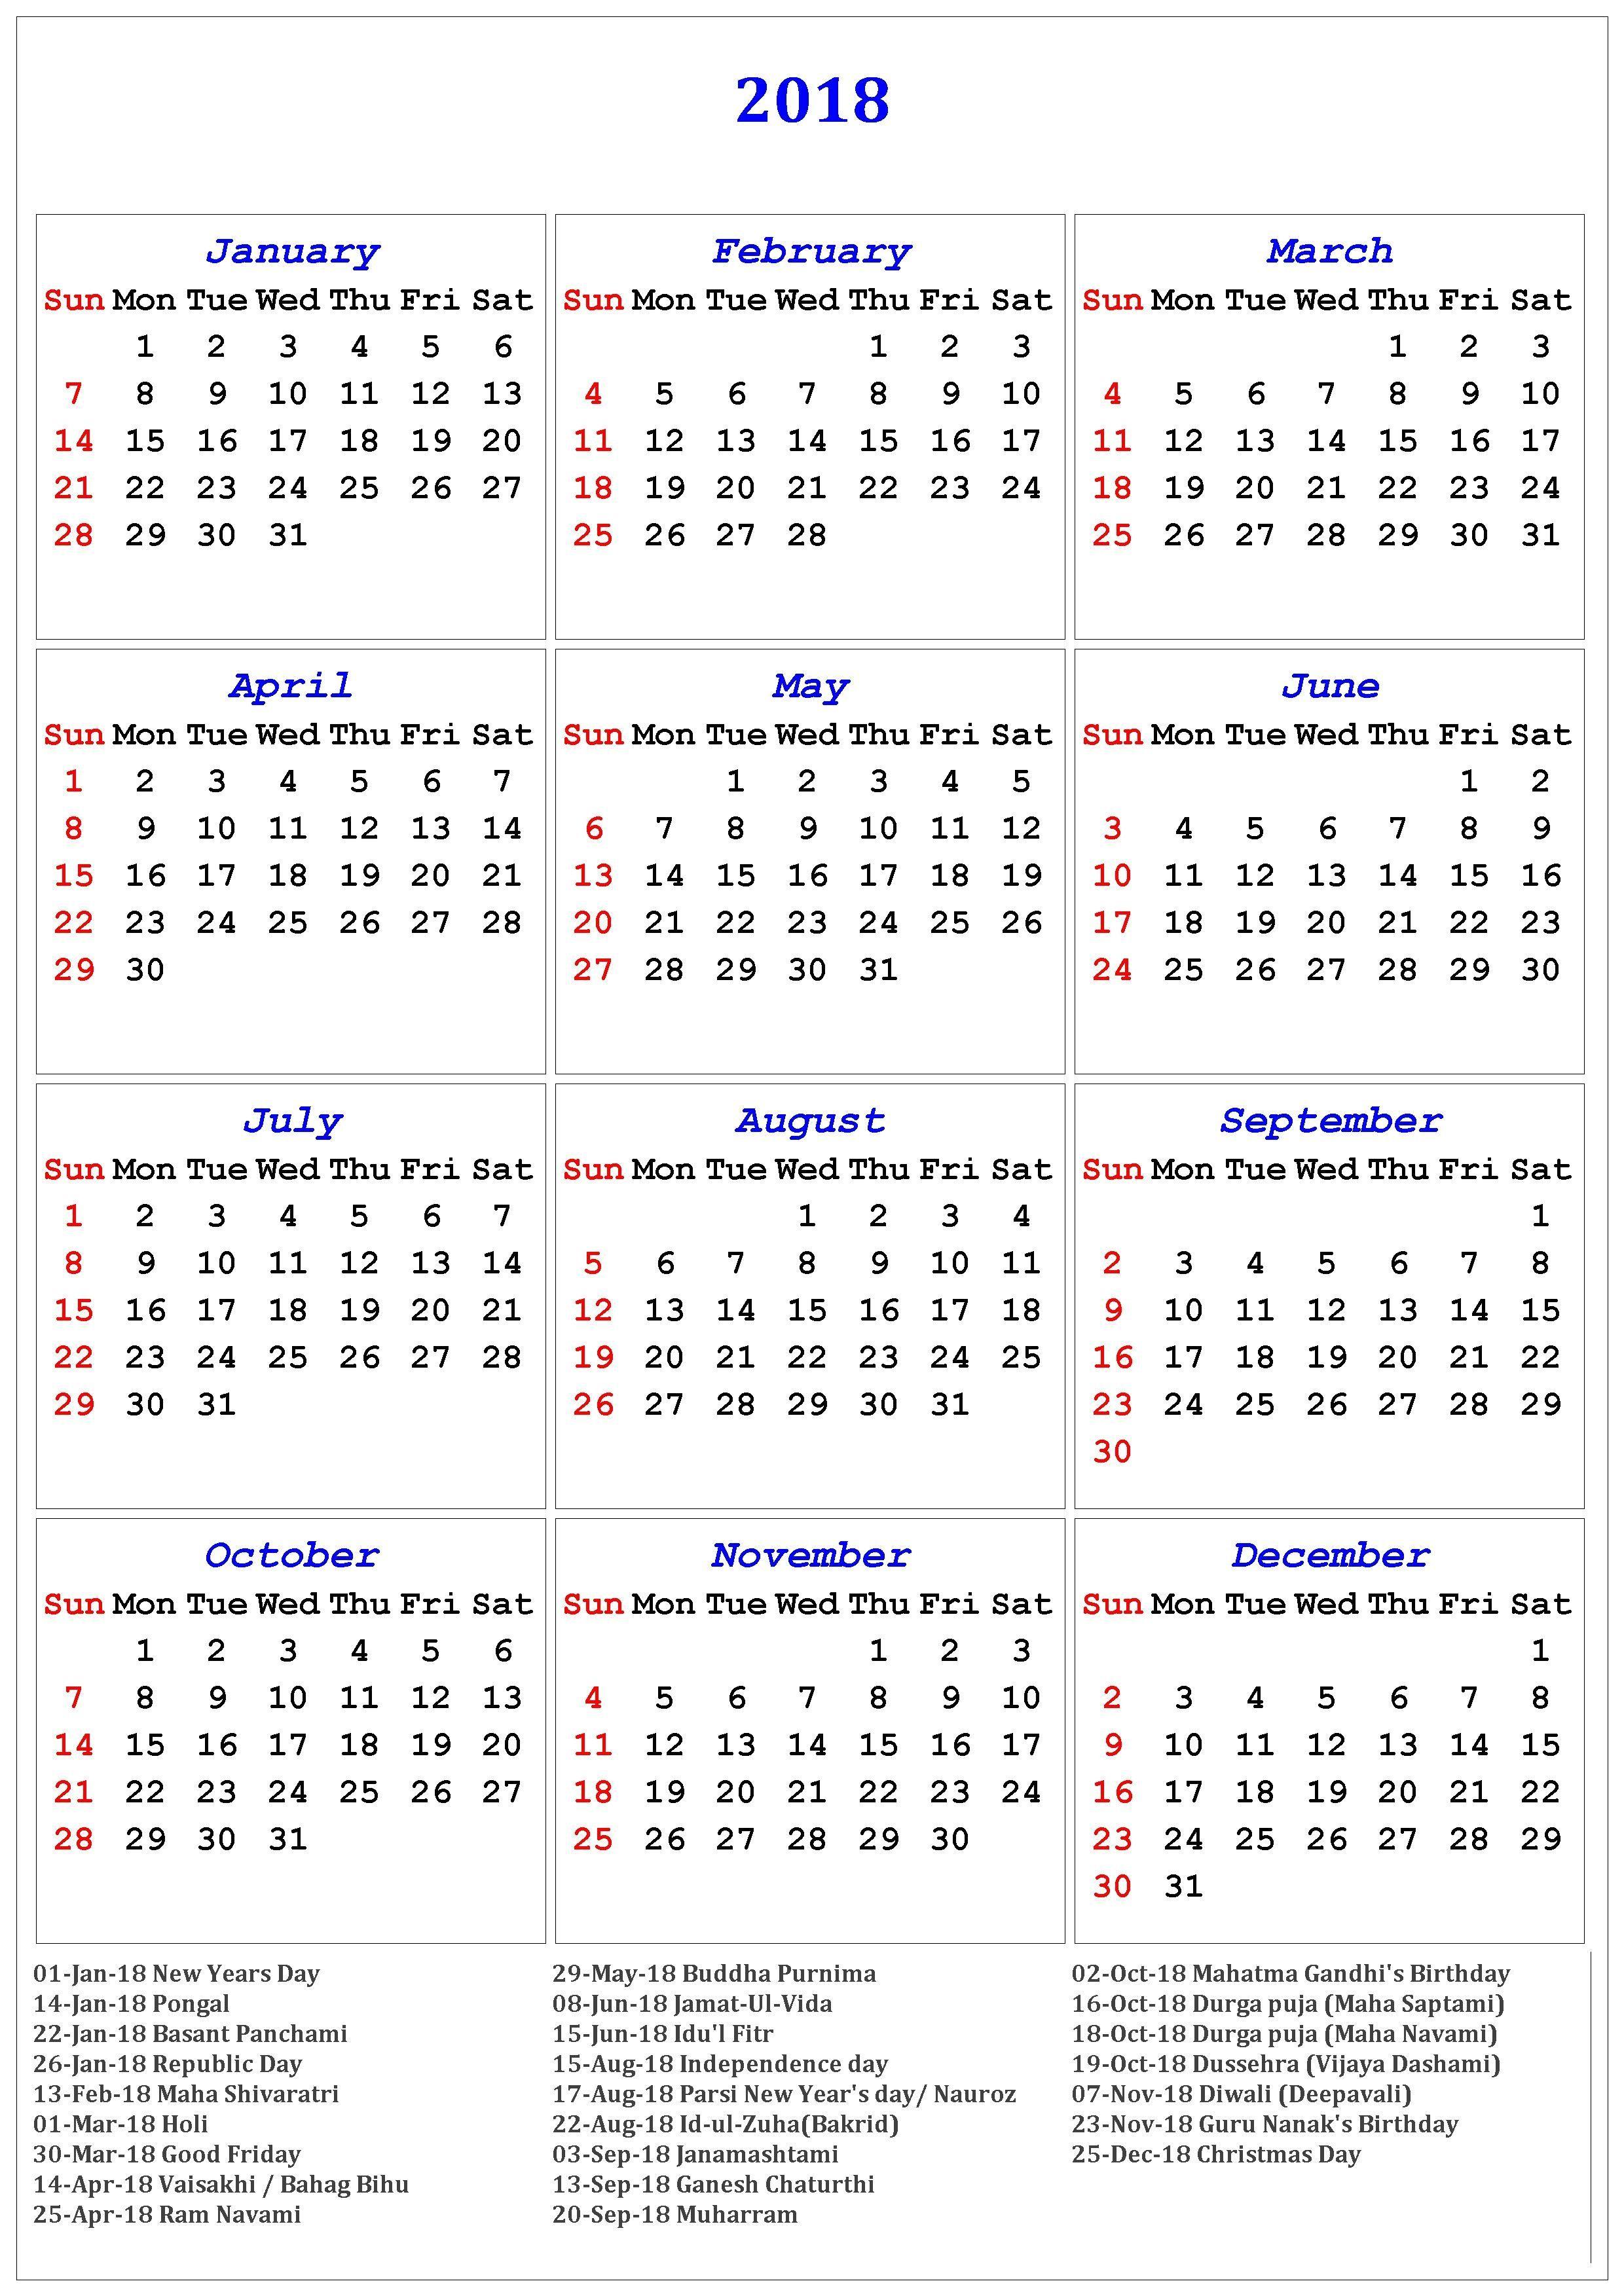 2018 Calendar Of Holidays